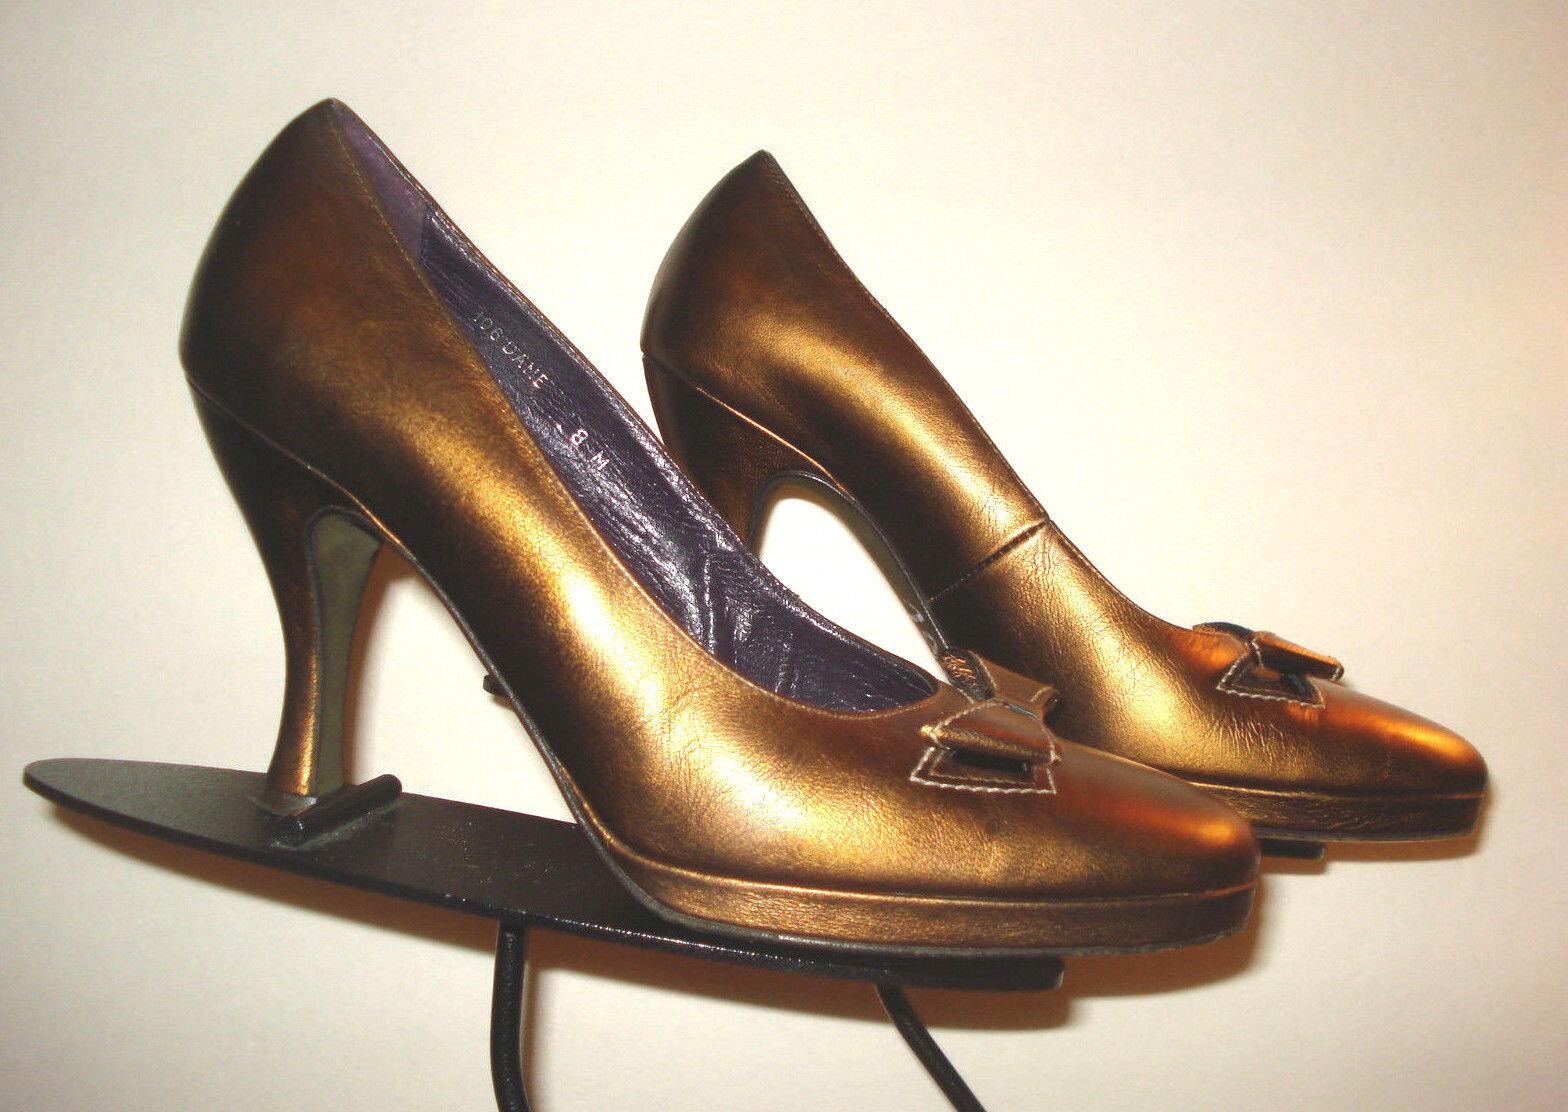 Donald J Pliner  Gold Bronze Leather Bow-Tie Bow-Tie Bow-Tie Classic Pump Sz. 8M MINTY 057cbb